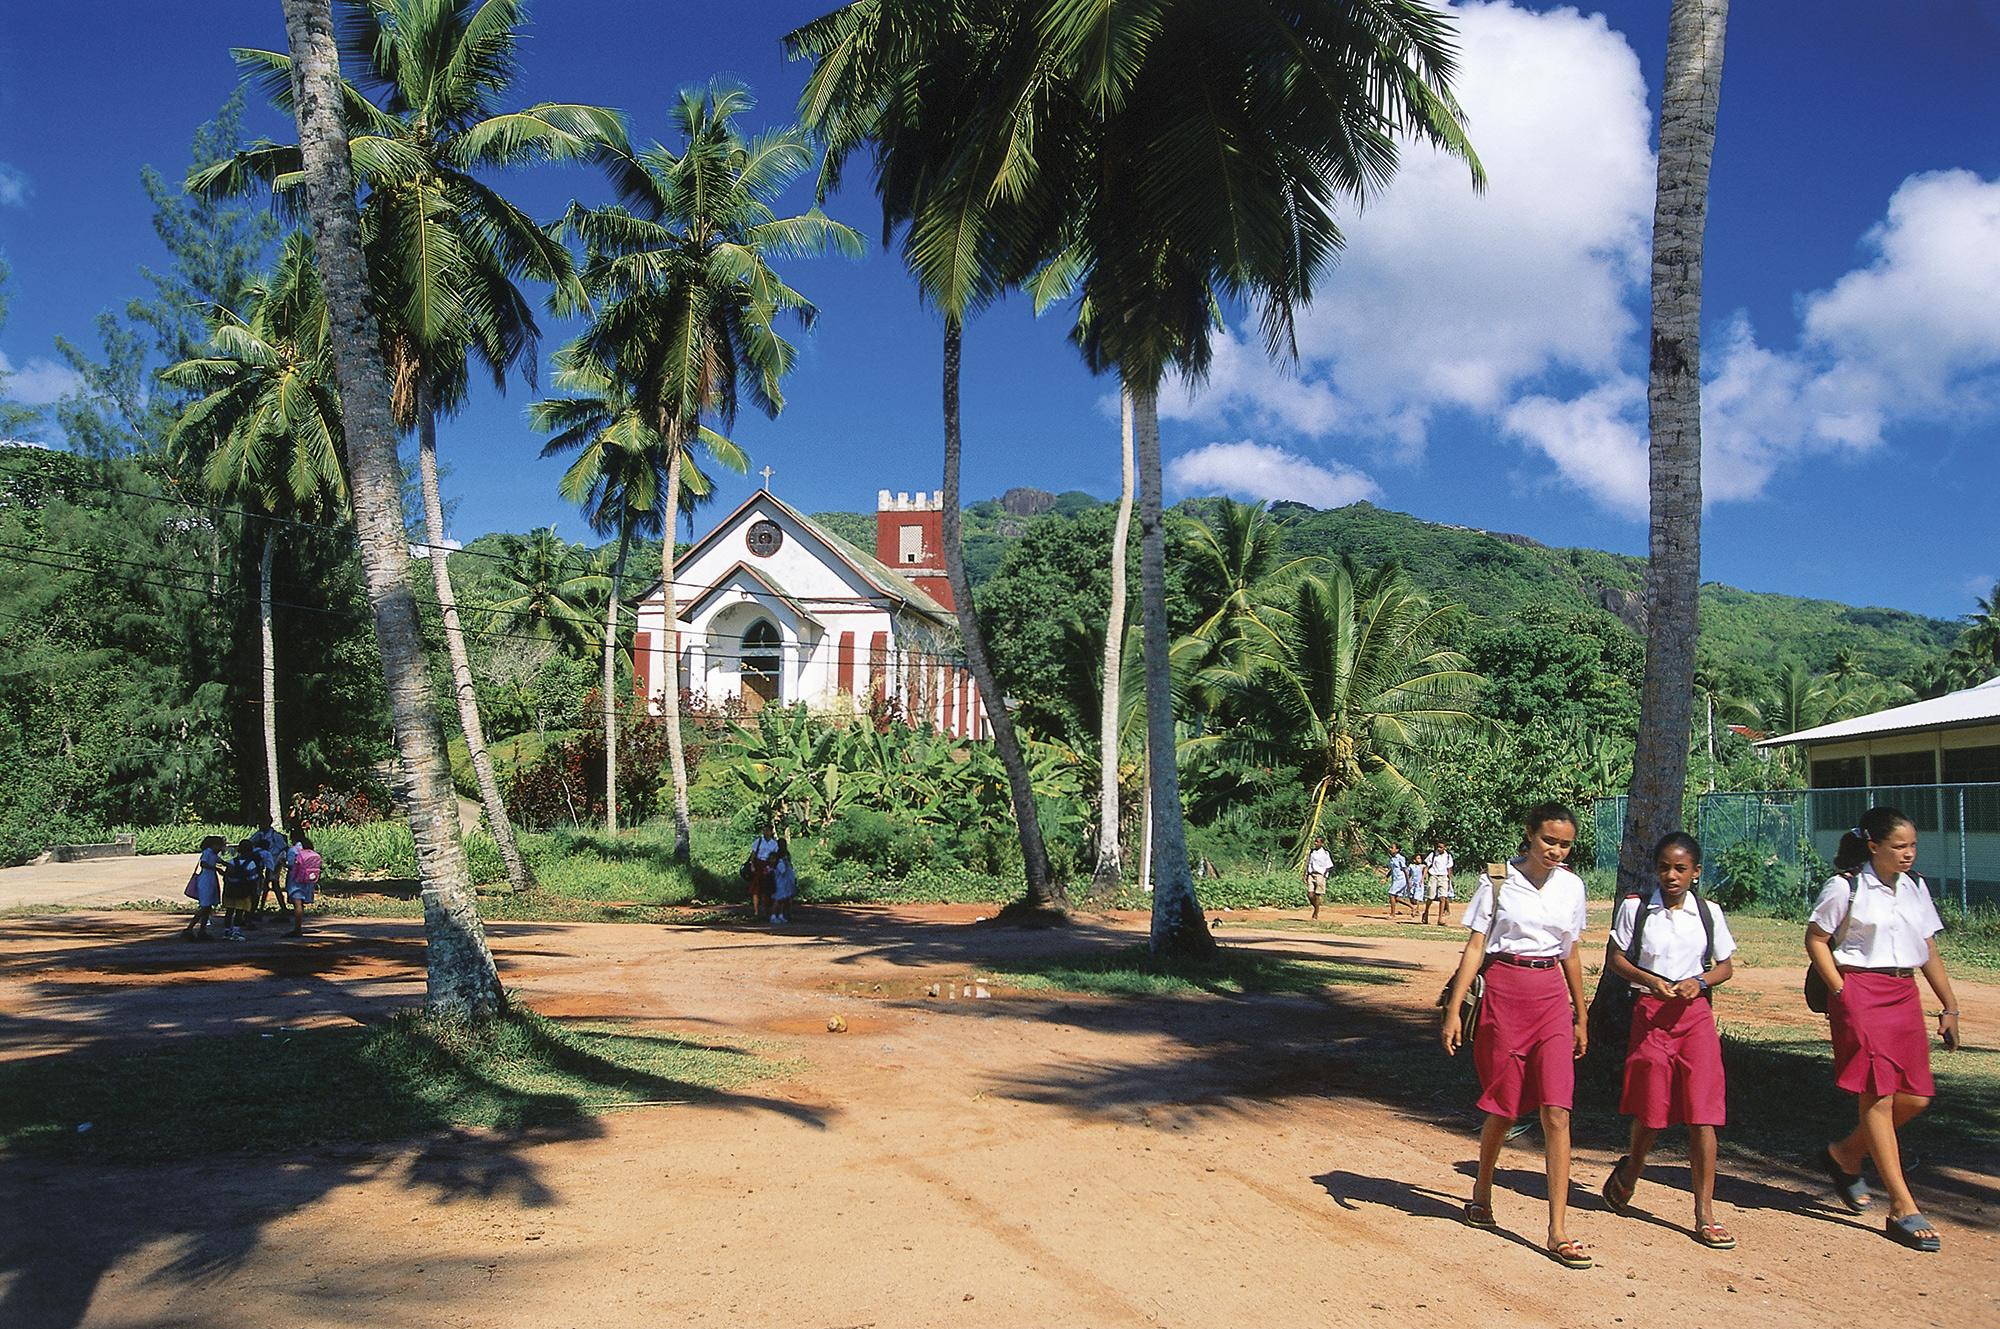 iglesia-catolica-seychelles. Iglesia católica cerca de Anse Boileau (Mahé)